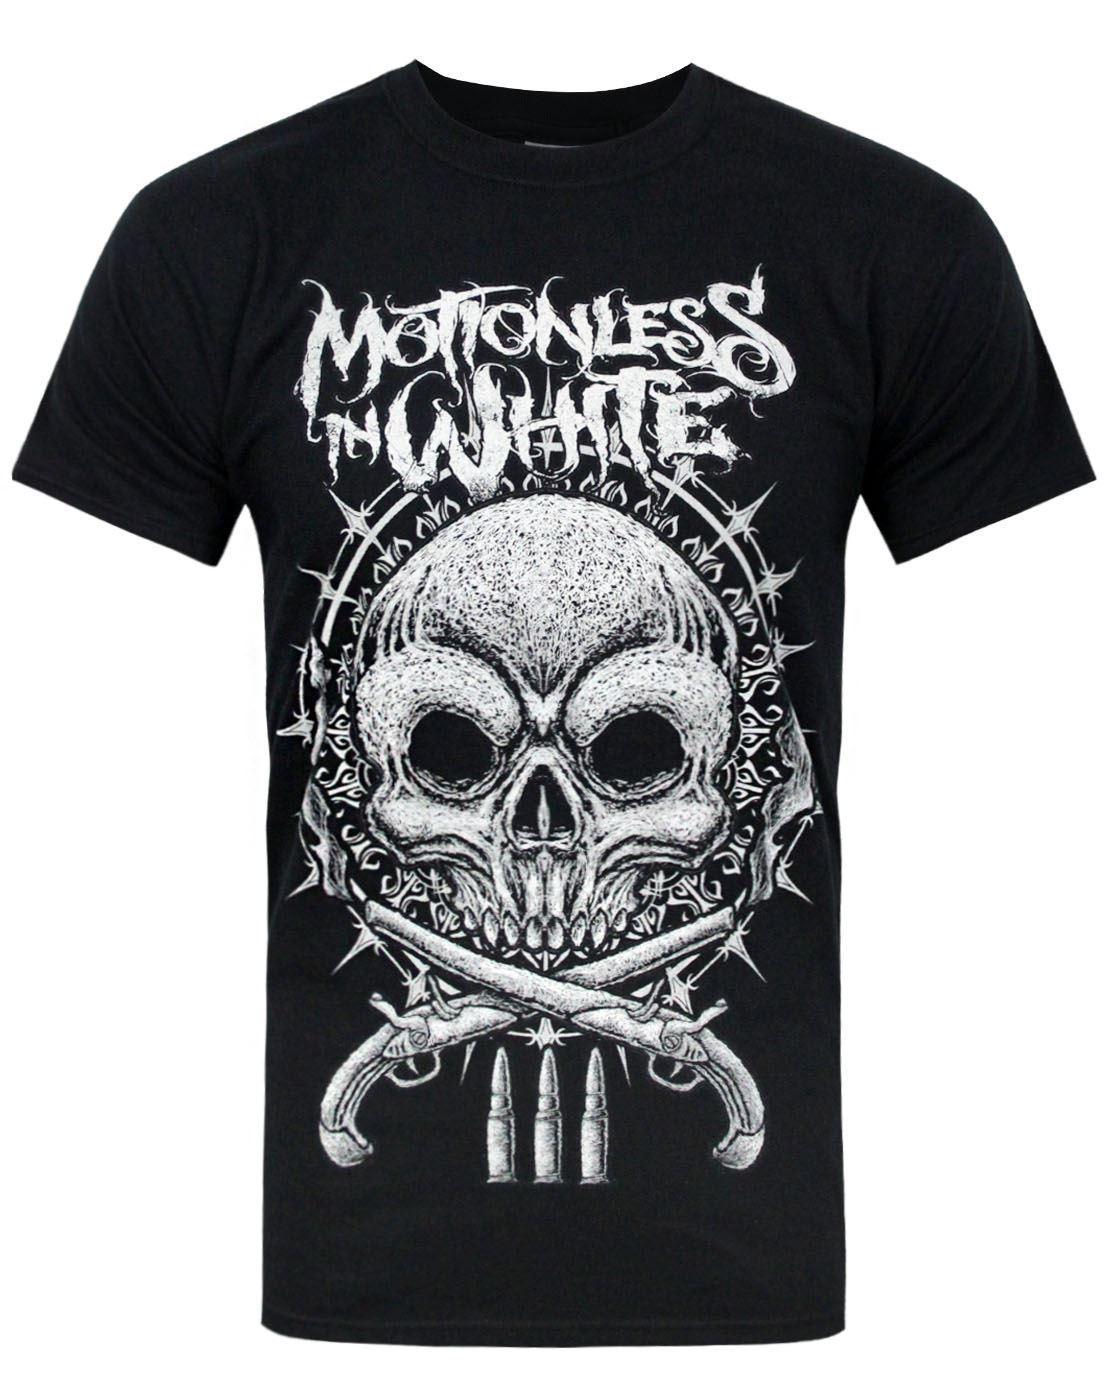 Mens Motionless-in-White Tee Shirt Cool Mesh Cotton Short Sleeve